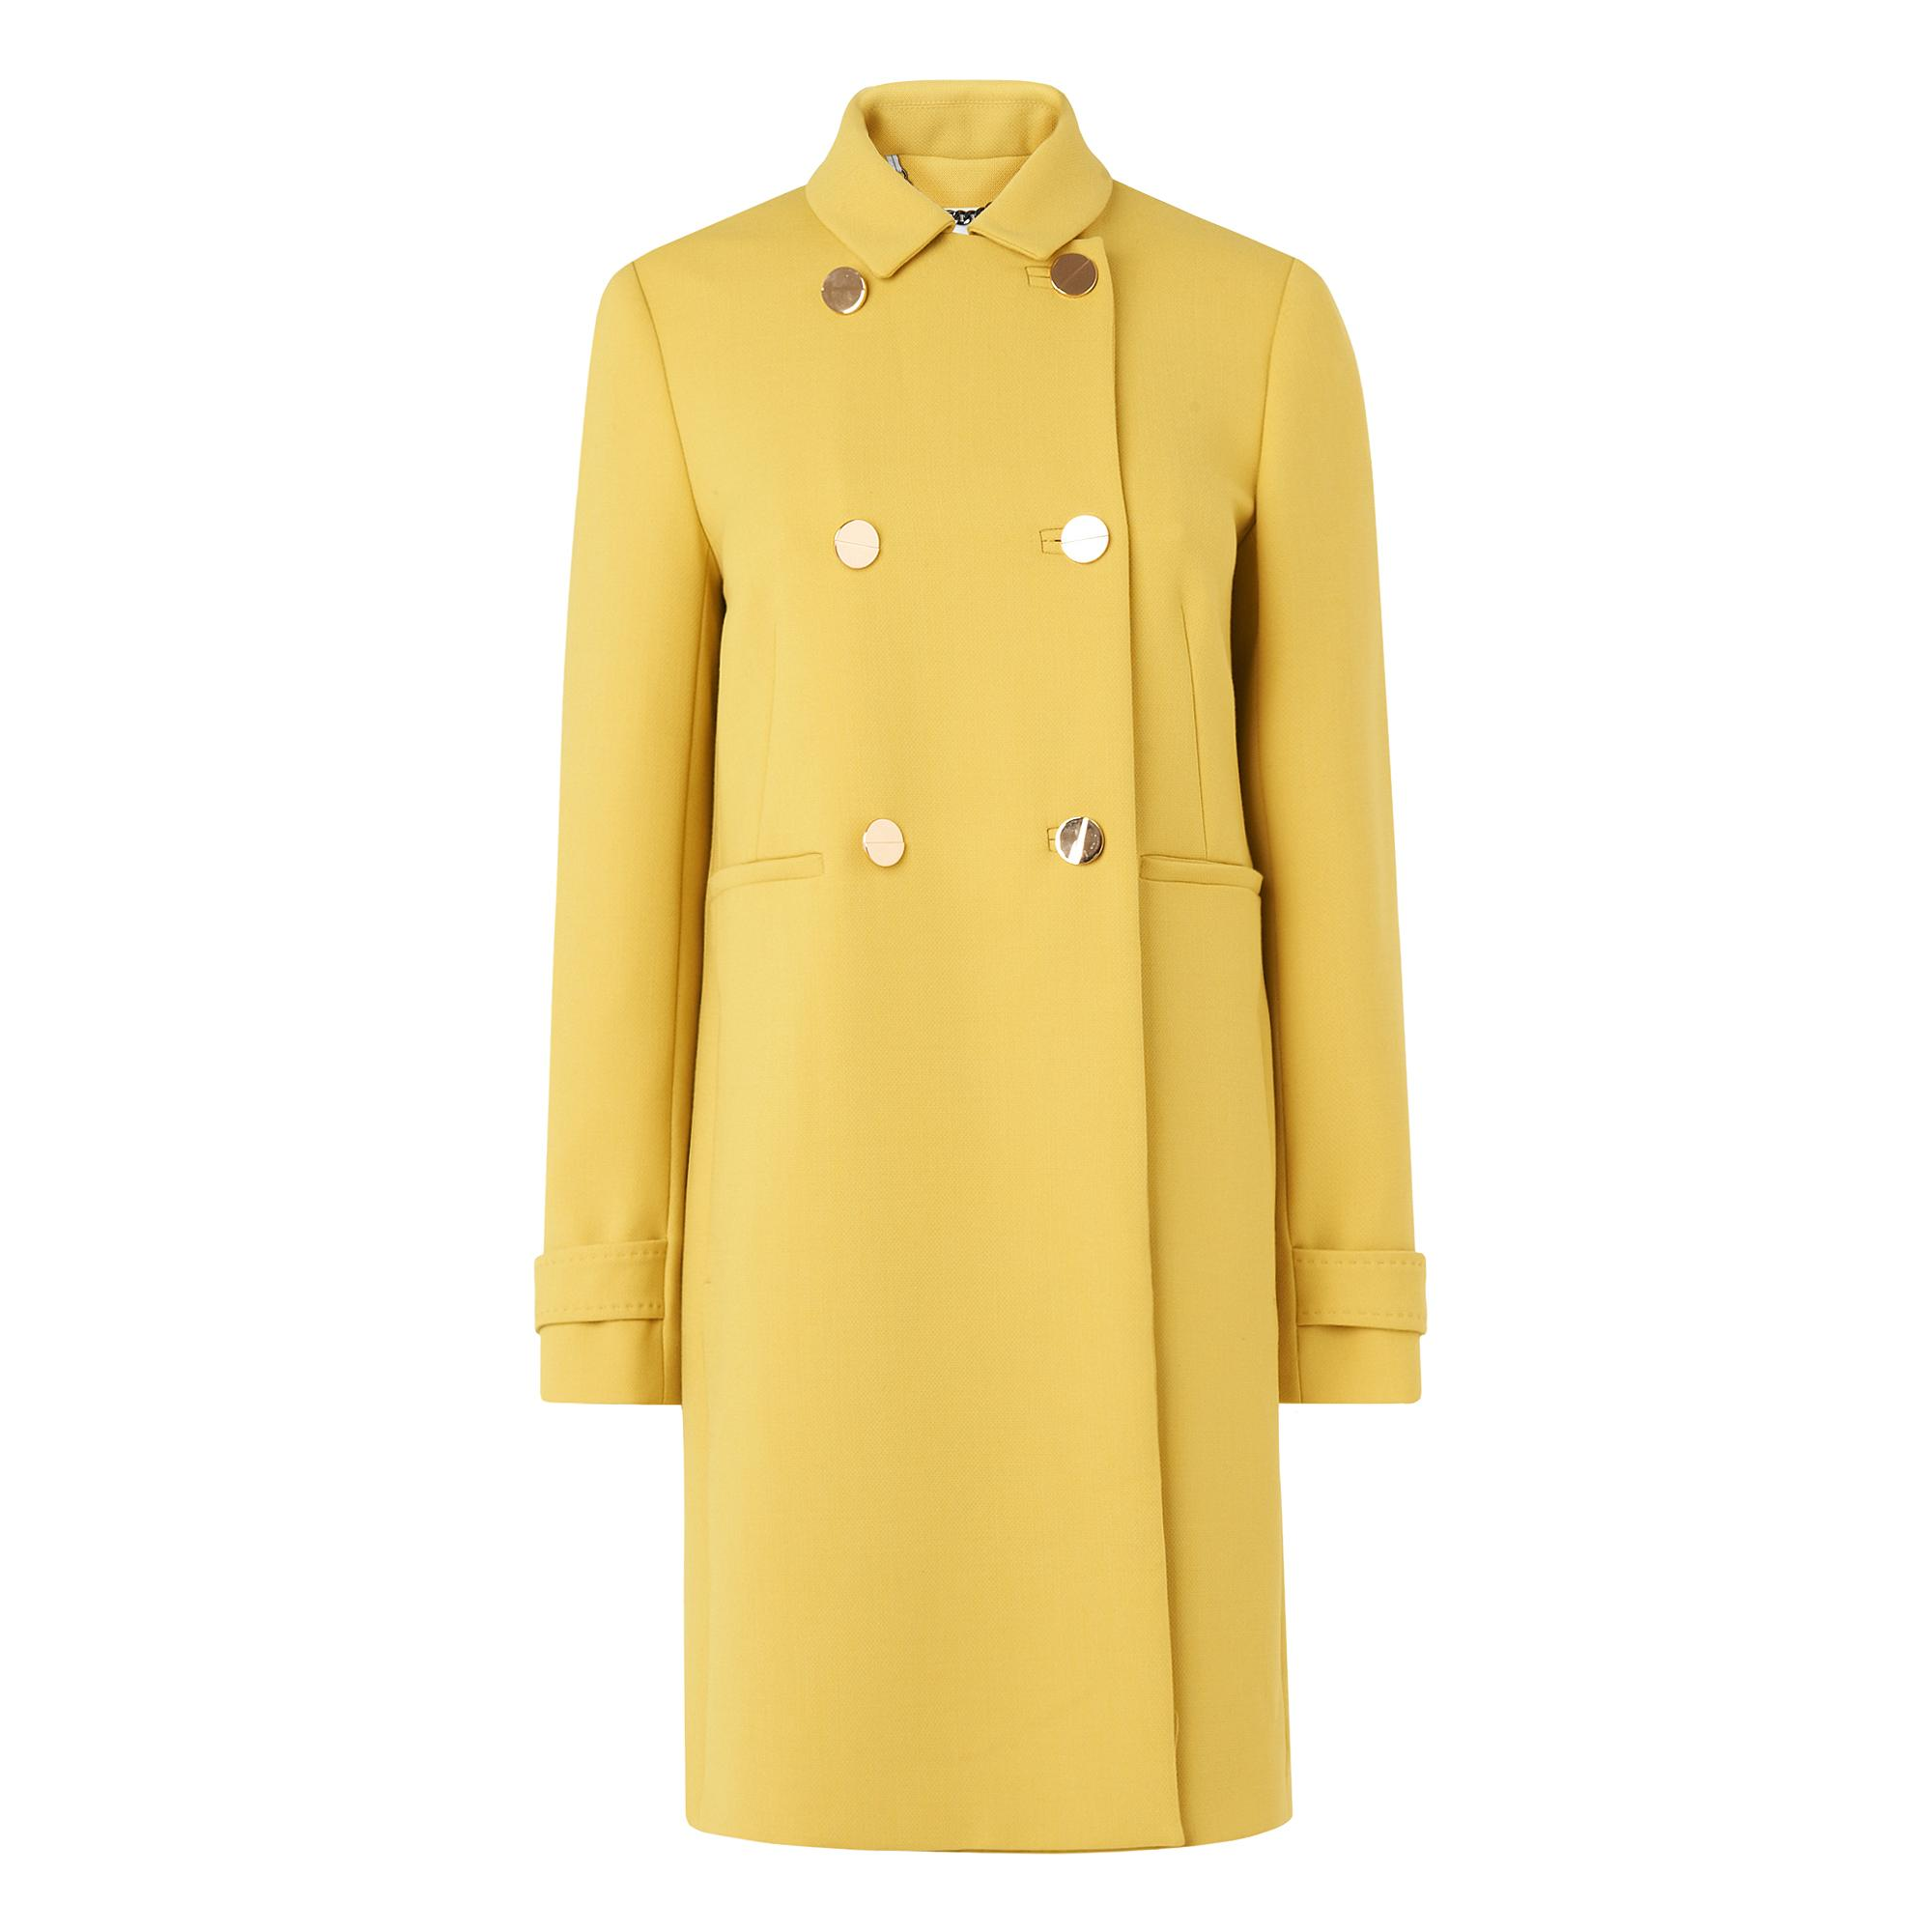 L.K.Bennett Bay Double Breasted Coat